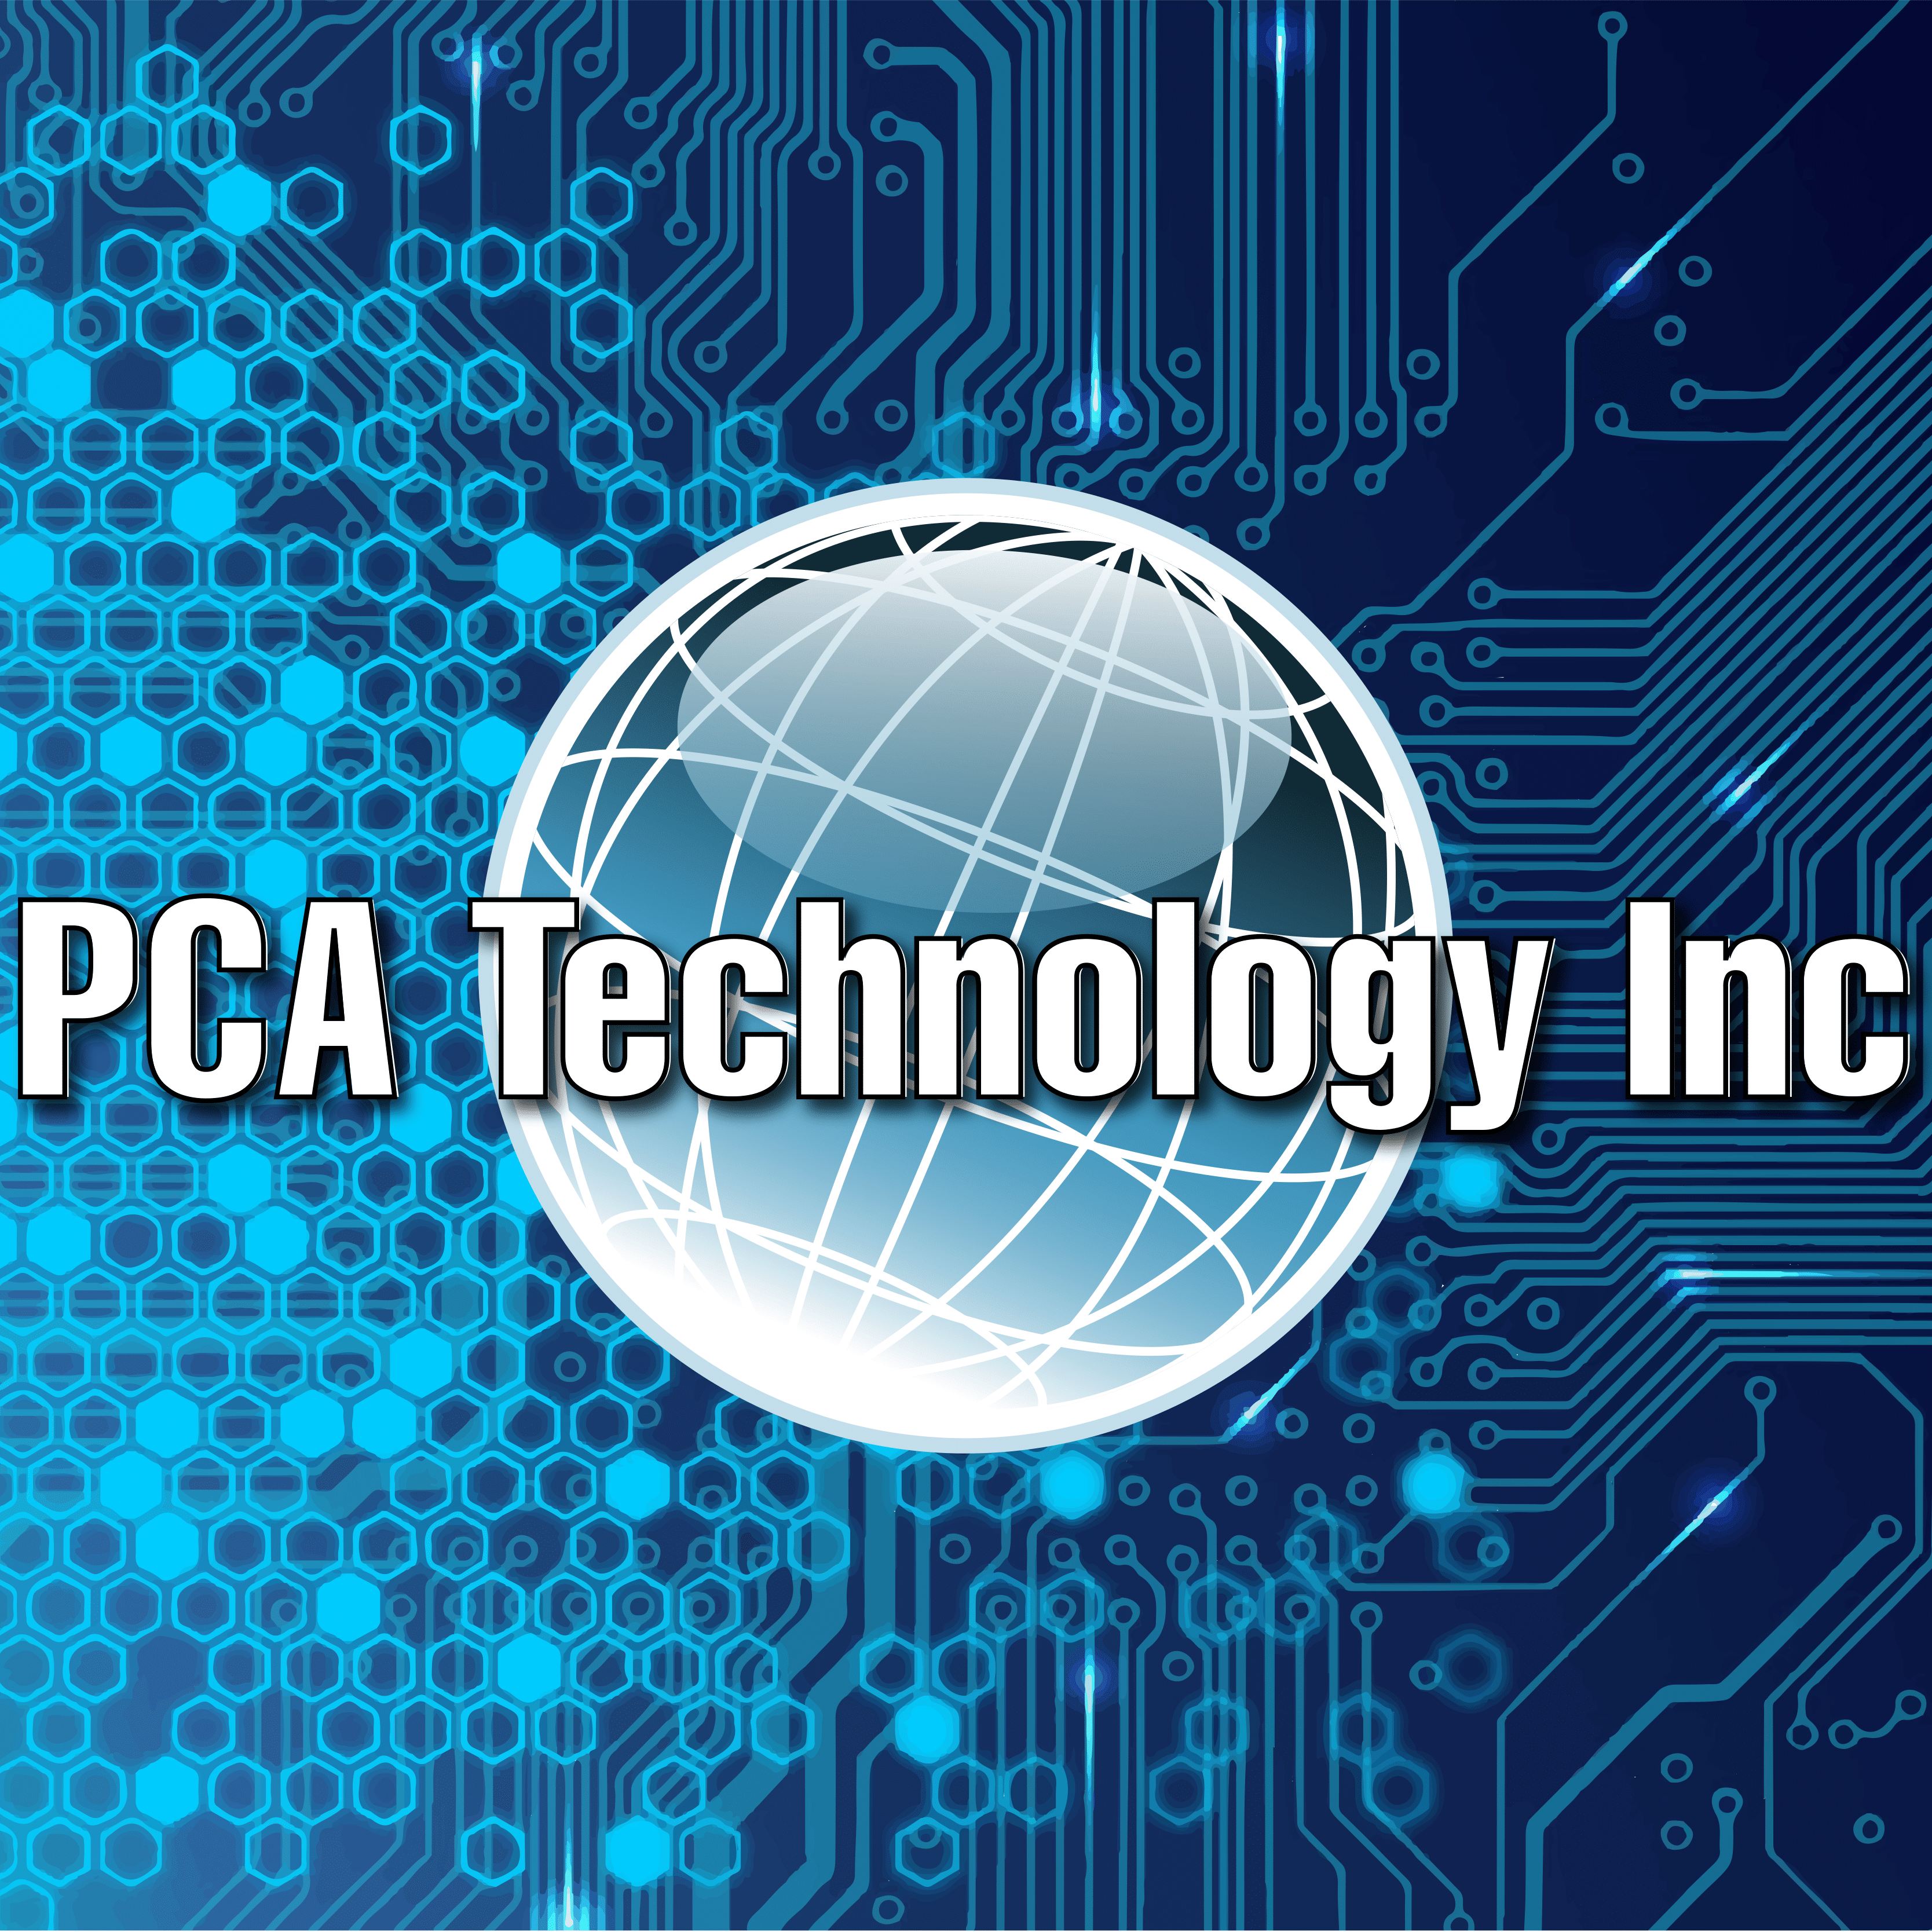 PCA TECHNOLOGY INC image 0